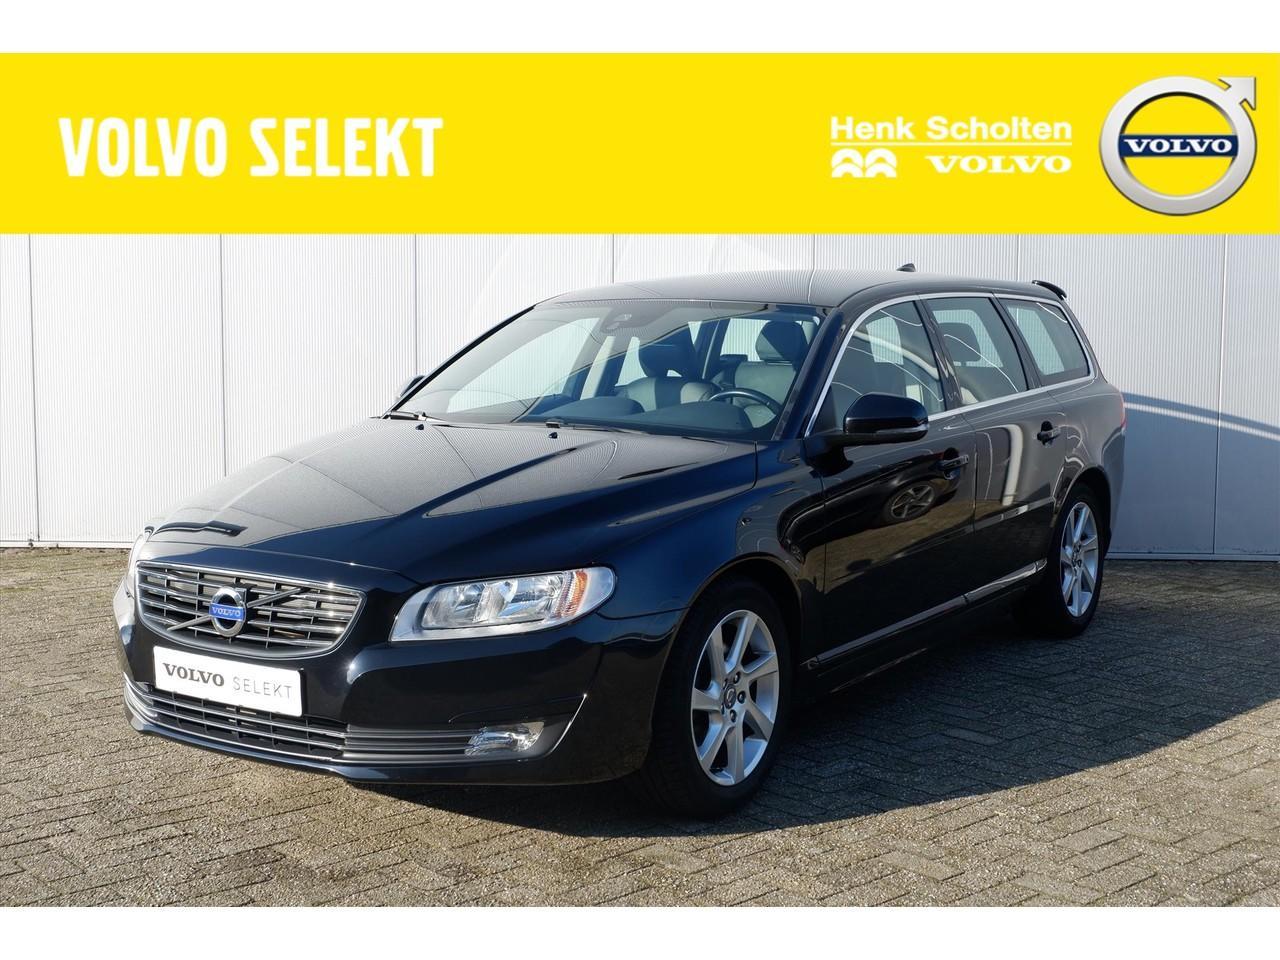 Volvo V70 D2 nordic+/ standkachel/volvo on call